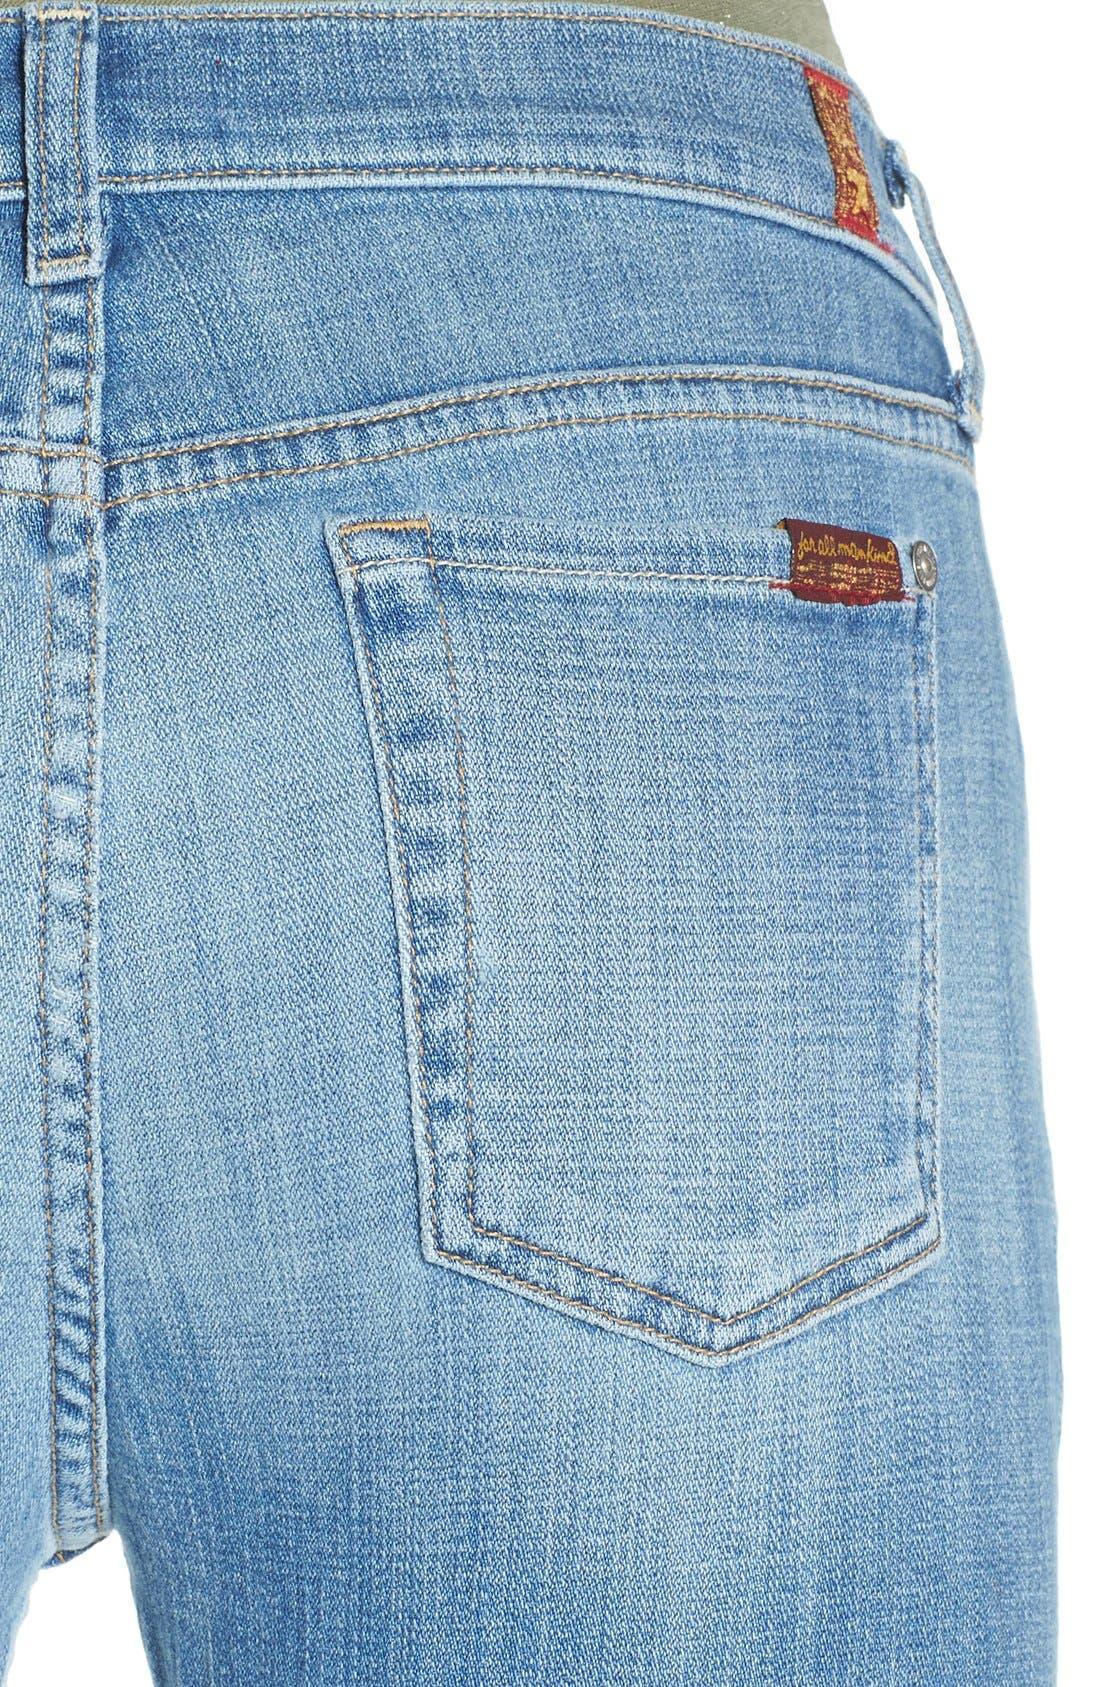 Alternate Image 4  - 7 For All Mankind® 'Josefina' Relaxed Skinny Jeans (Medium Broken Twill)